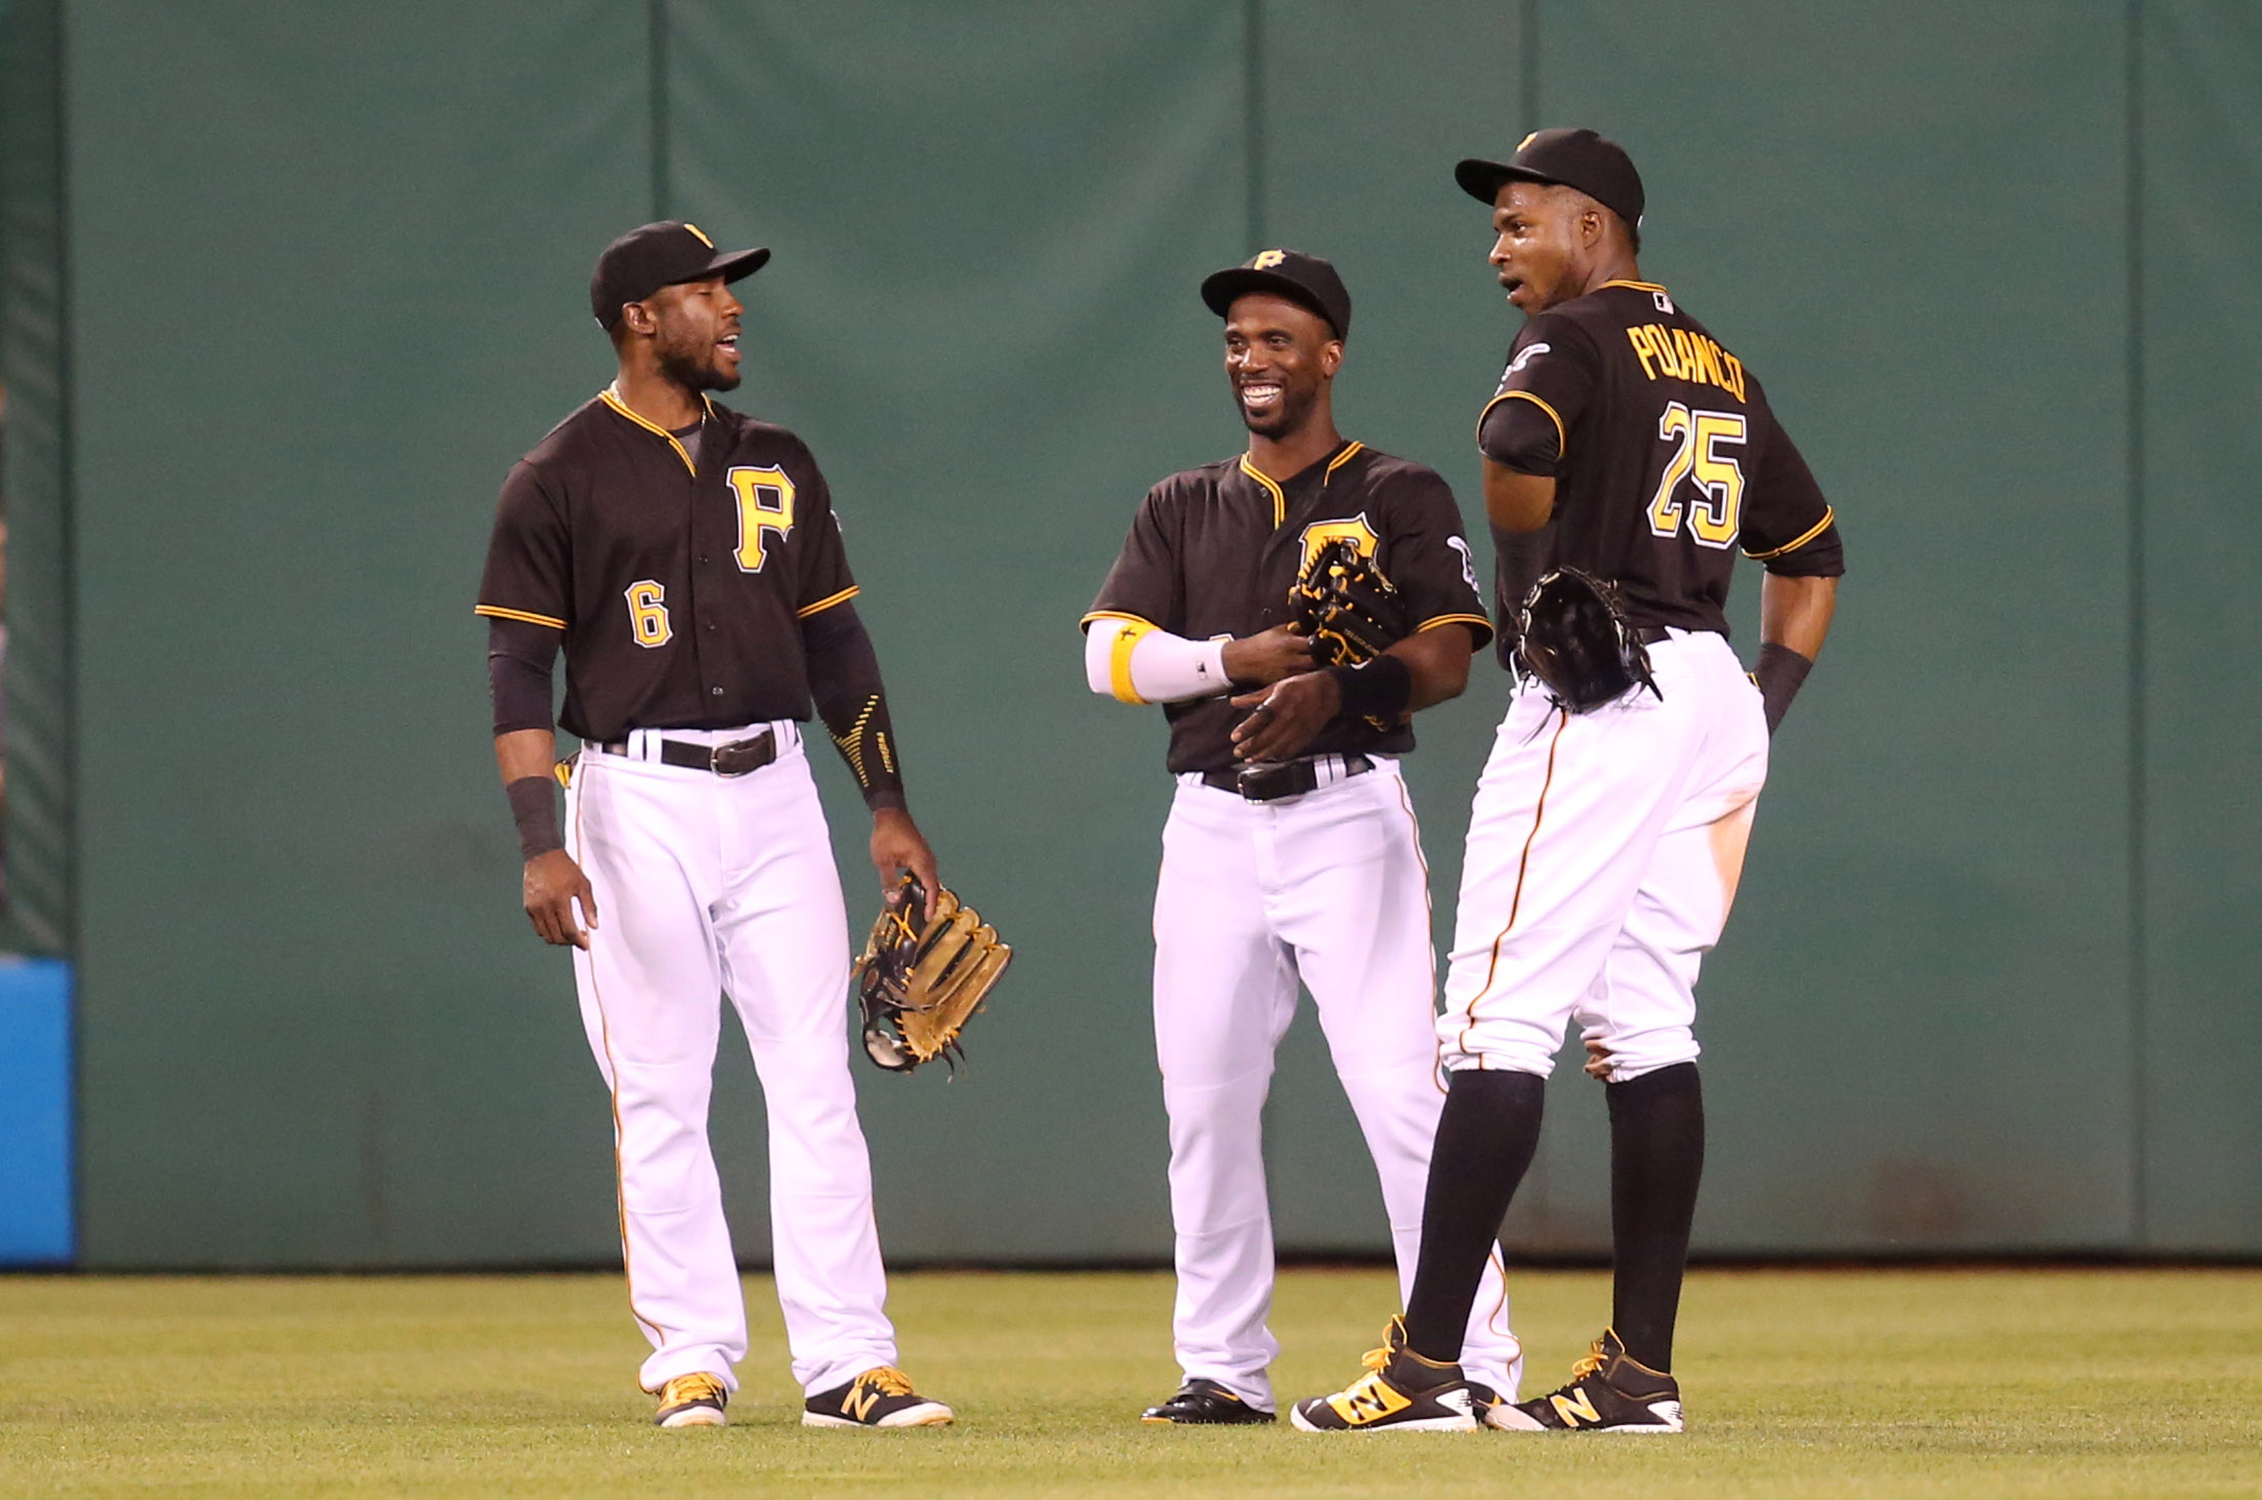 Pittsburgh Pirates: Nine Pittsburgh Pirates Players Named To World Baseball